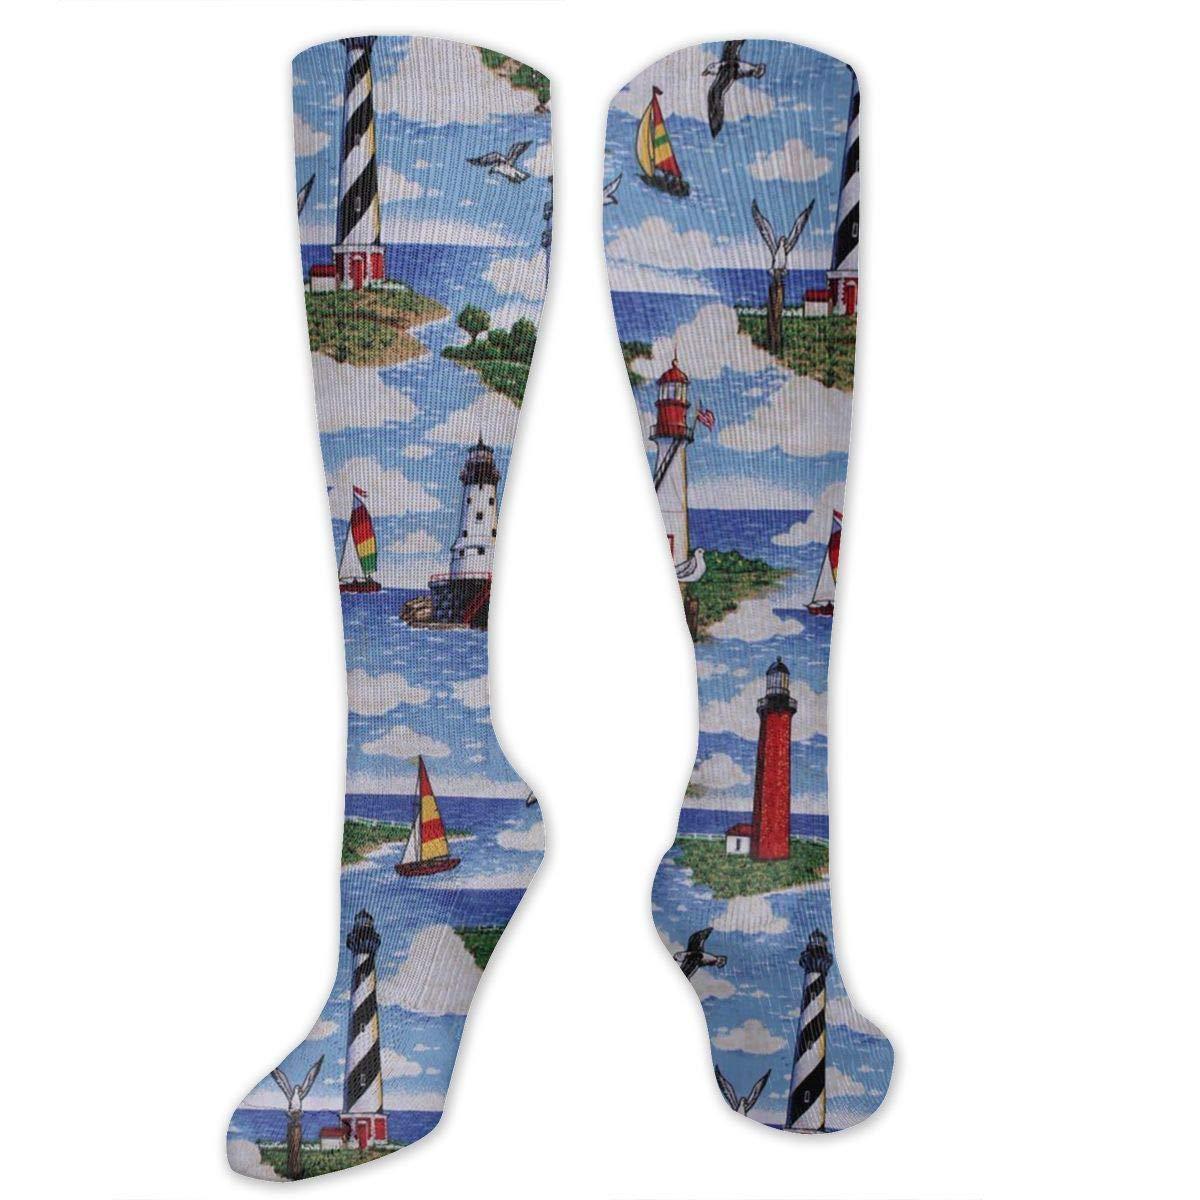 Lighthouses Scene Big Sable Compression Socks Long Knee Stockings High Socks for Hiking Soccer Running